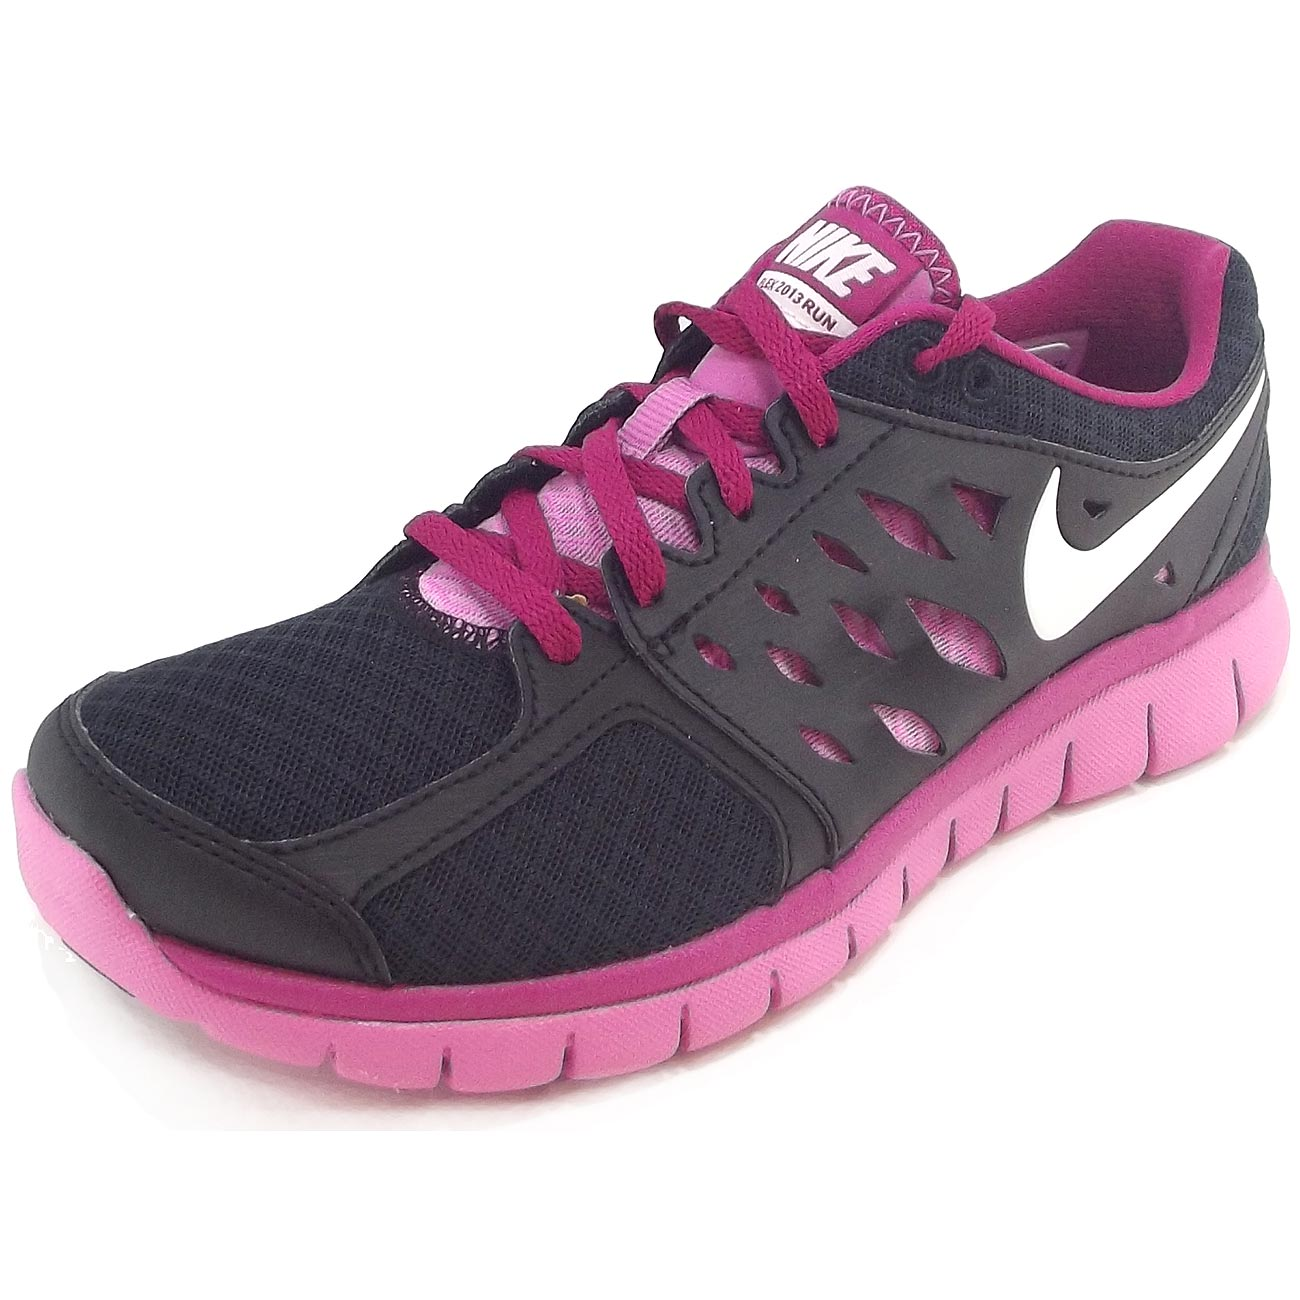 official new appearance watch Nike Flex 2013 Run Women Womens Running Shoes black/violet